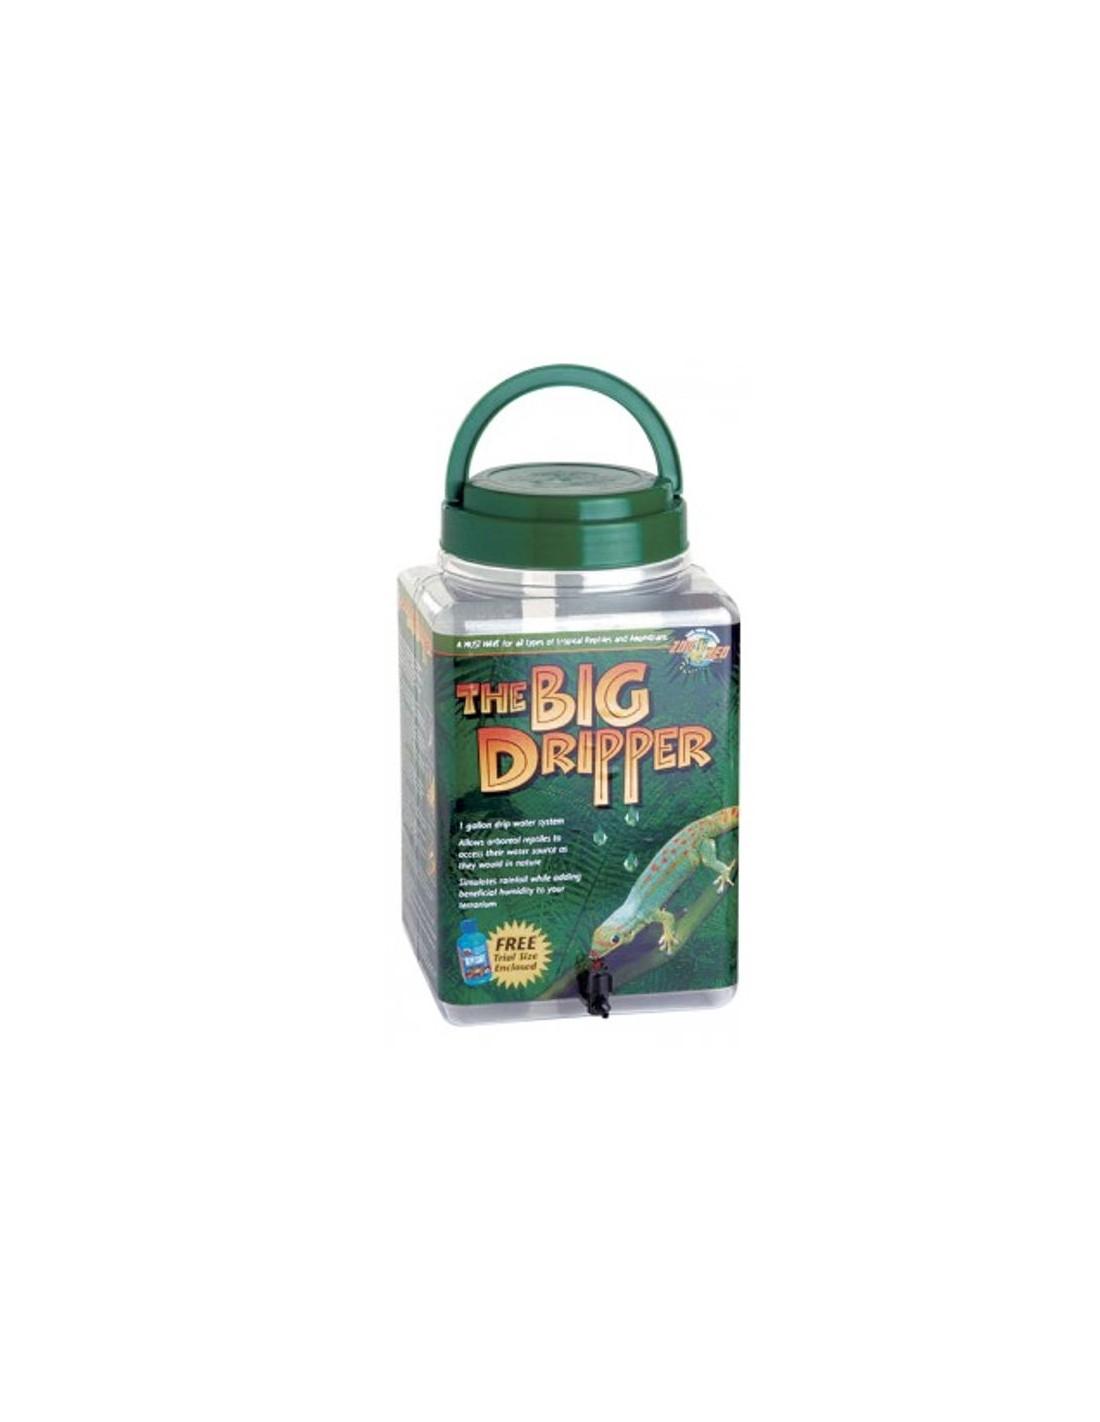 Exo Terra Dripper Plant Drip Watering System: Zoo Med Big Dripper